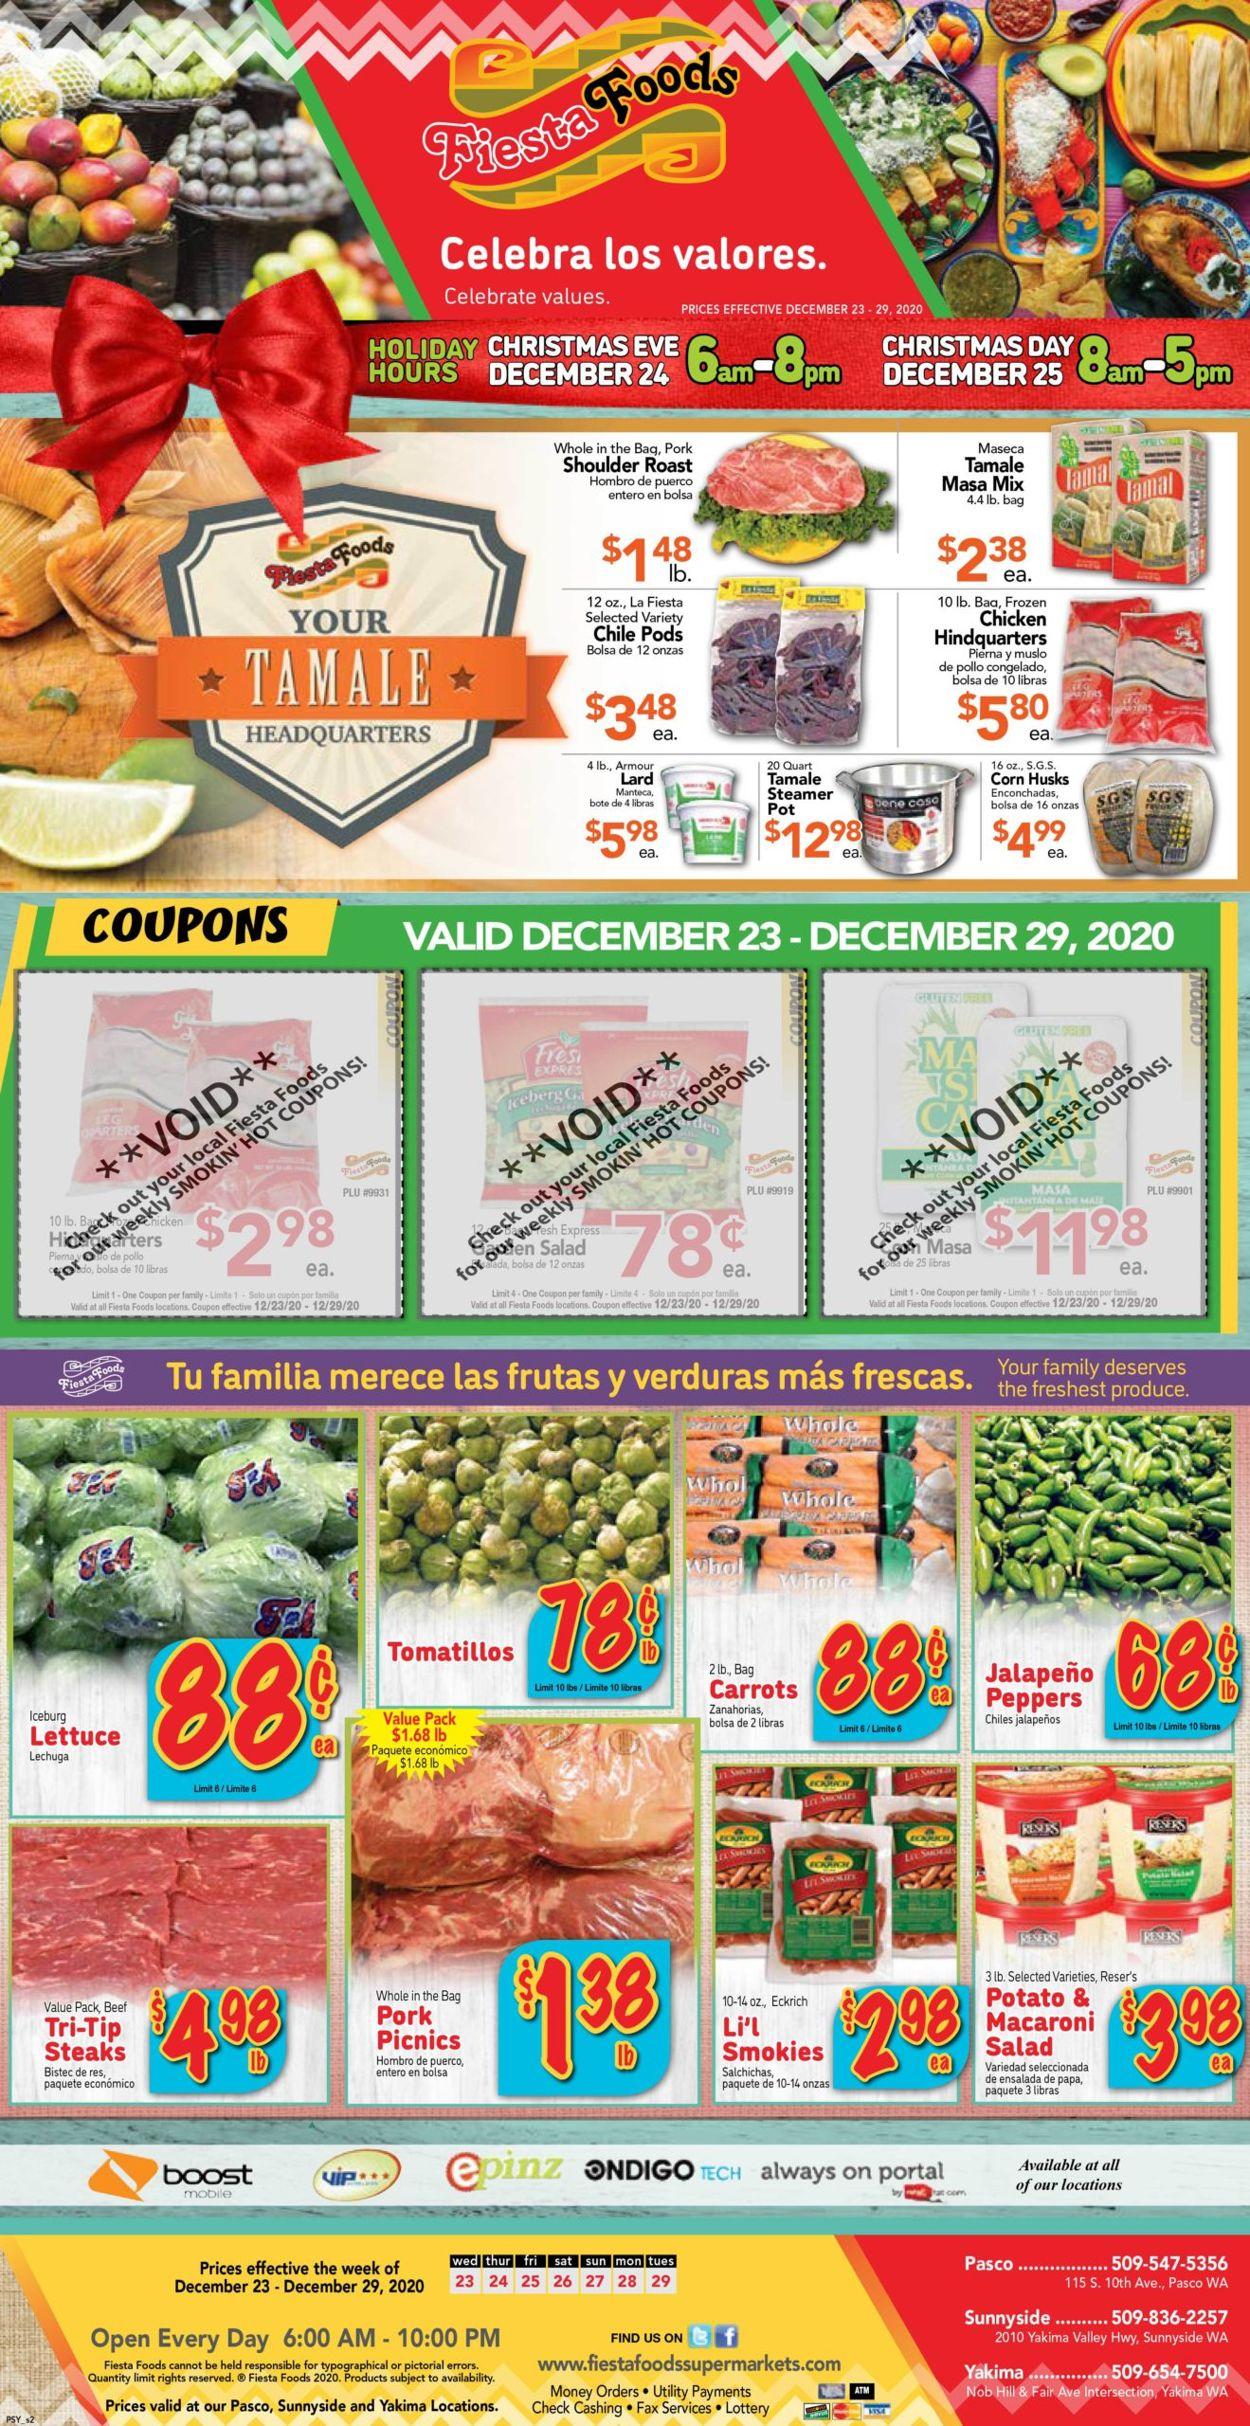 Fiesta Foods SuperMarkets Weekly Ad Circular - valid 12/23-12/29/2020